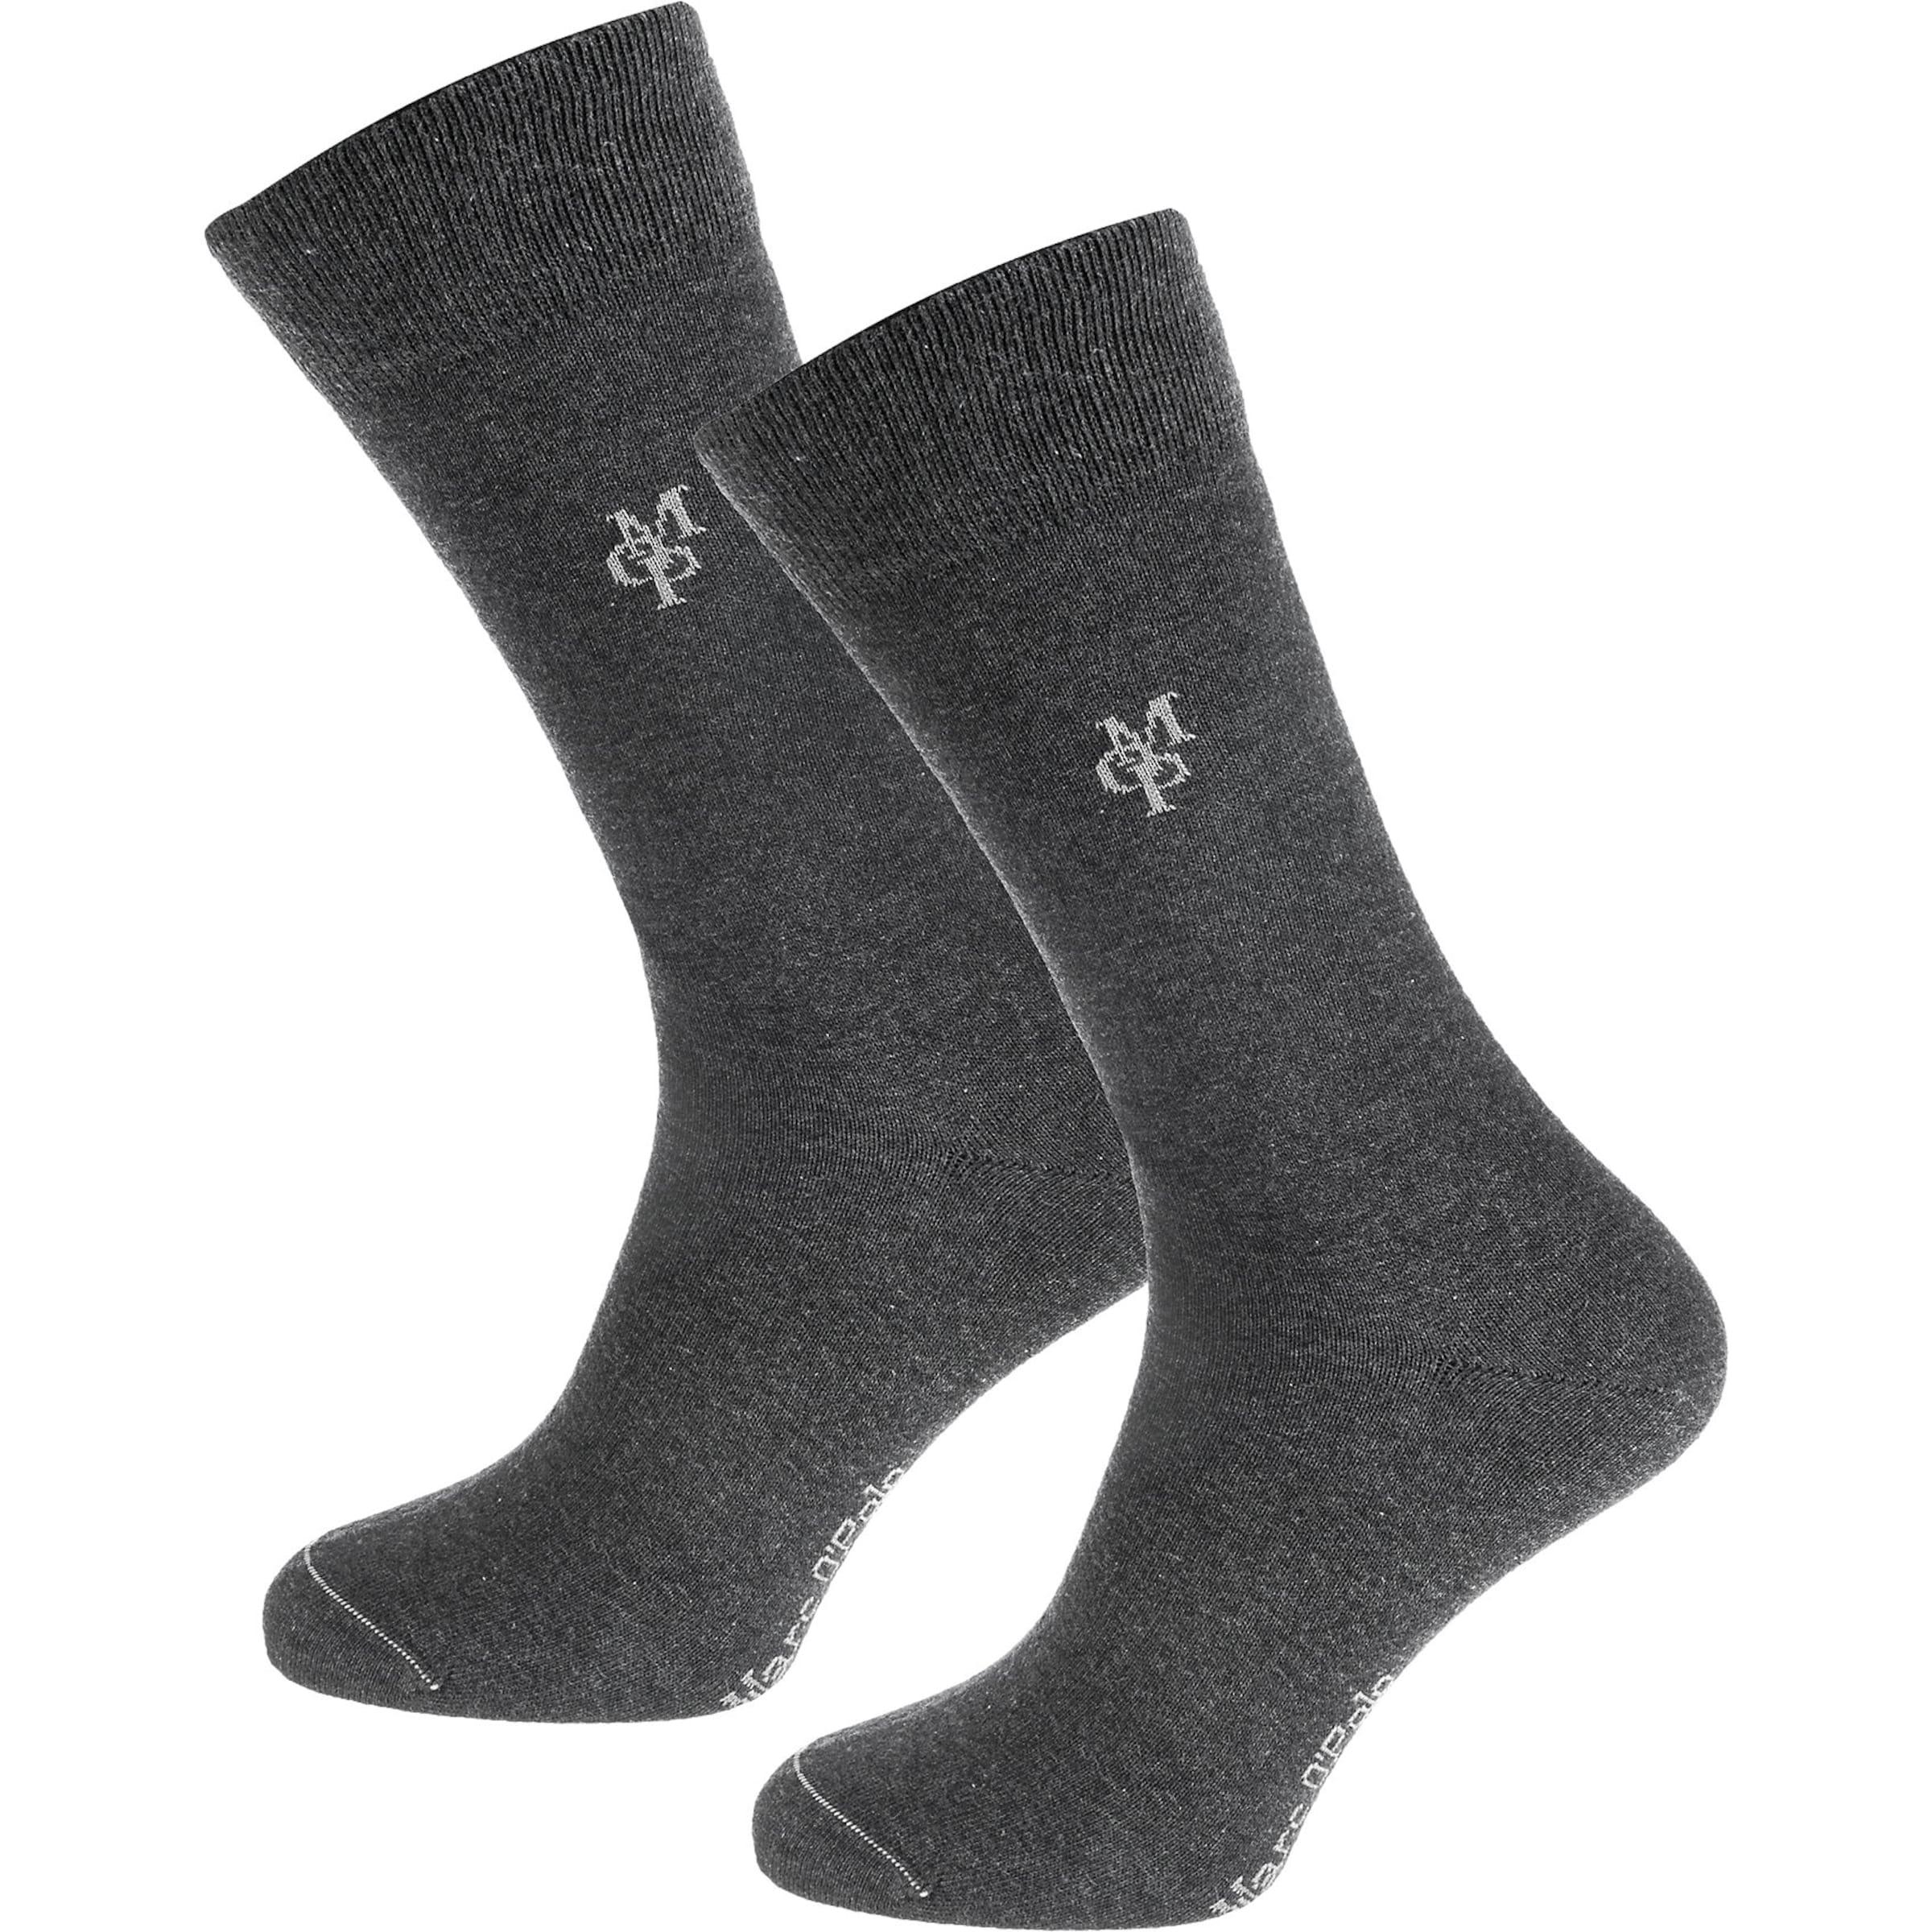 Marc O'Polo Larsen 2 Paar Socken Rabatt Bestseller Extrem Online Billige Wahl Mode-Stil Online-Verkauf Preiswert RstgOEkZ7